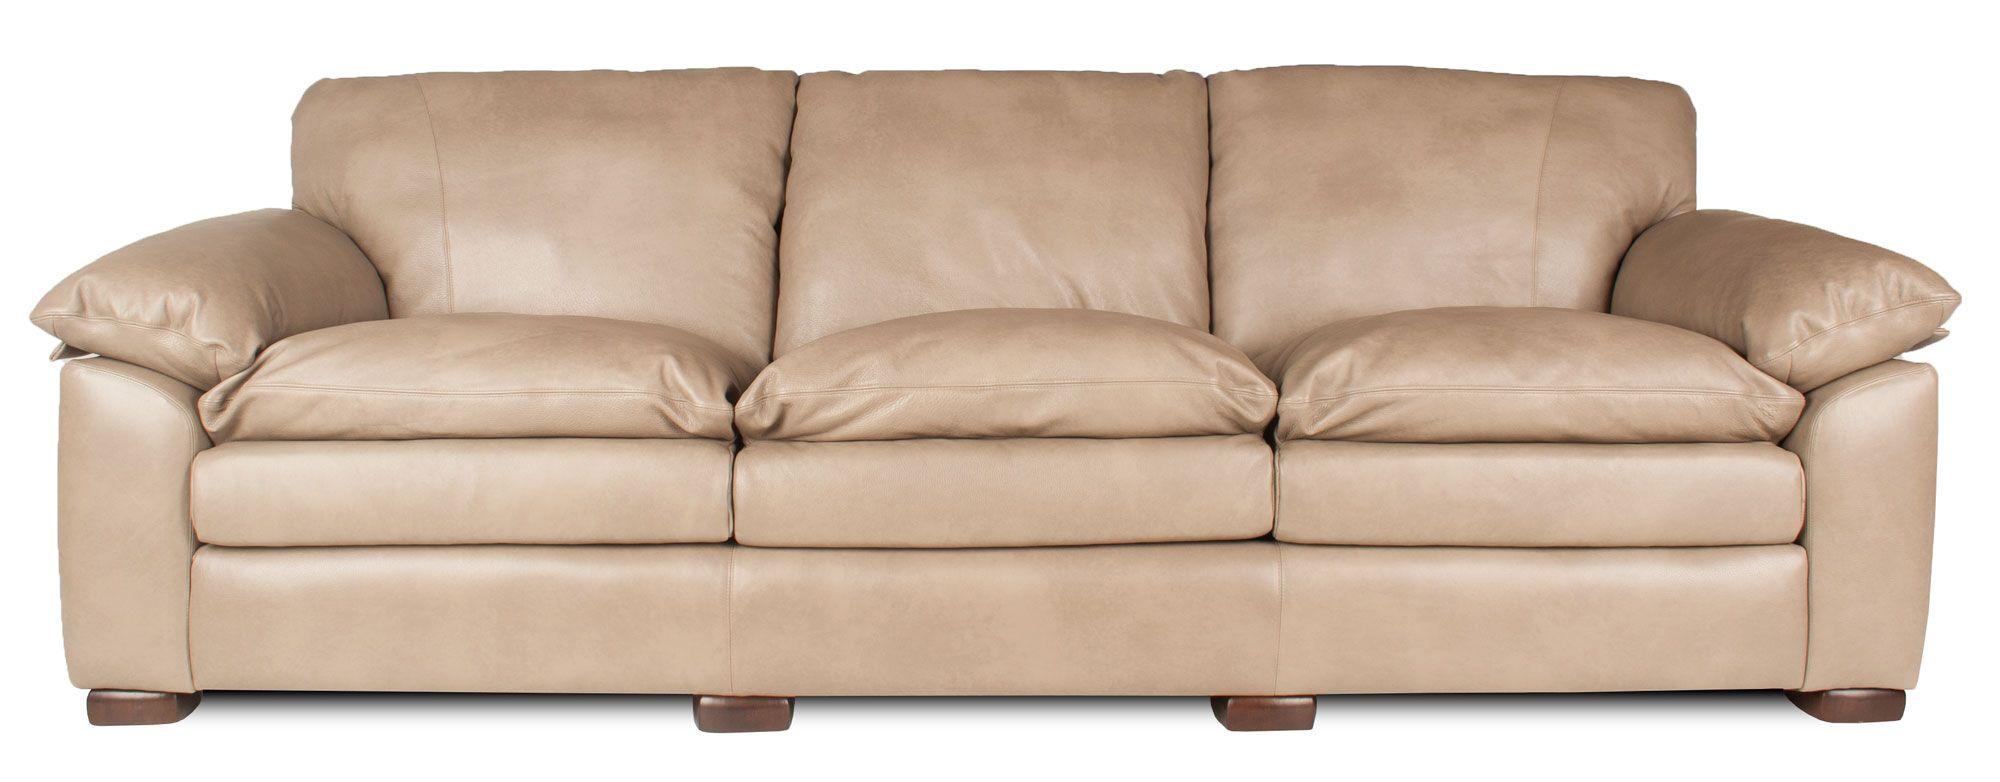 Leather Creations Deep Sofas